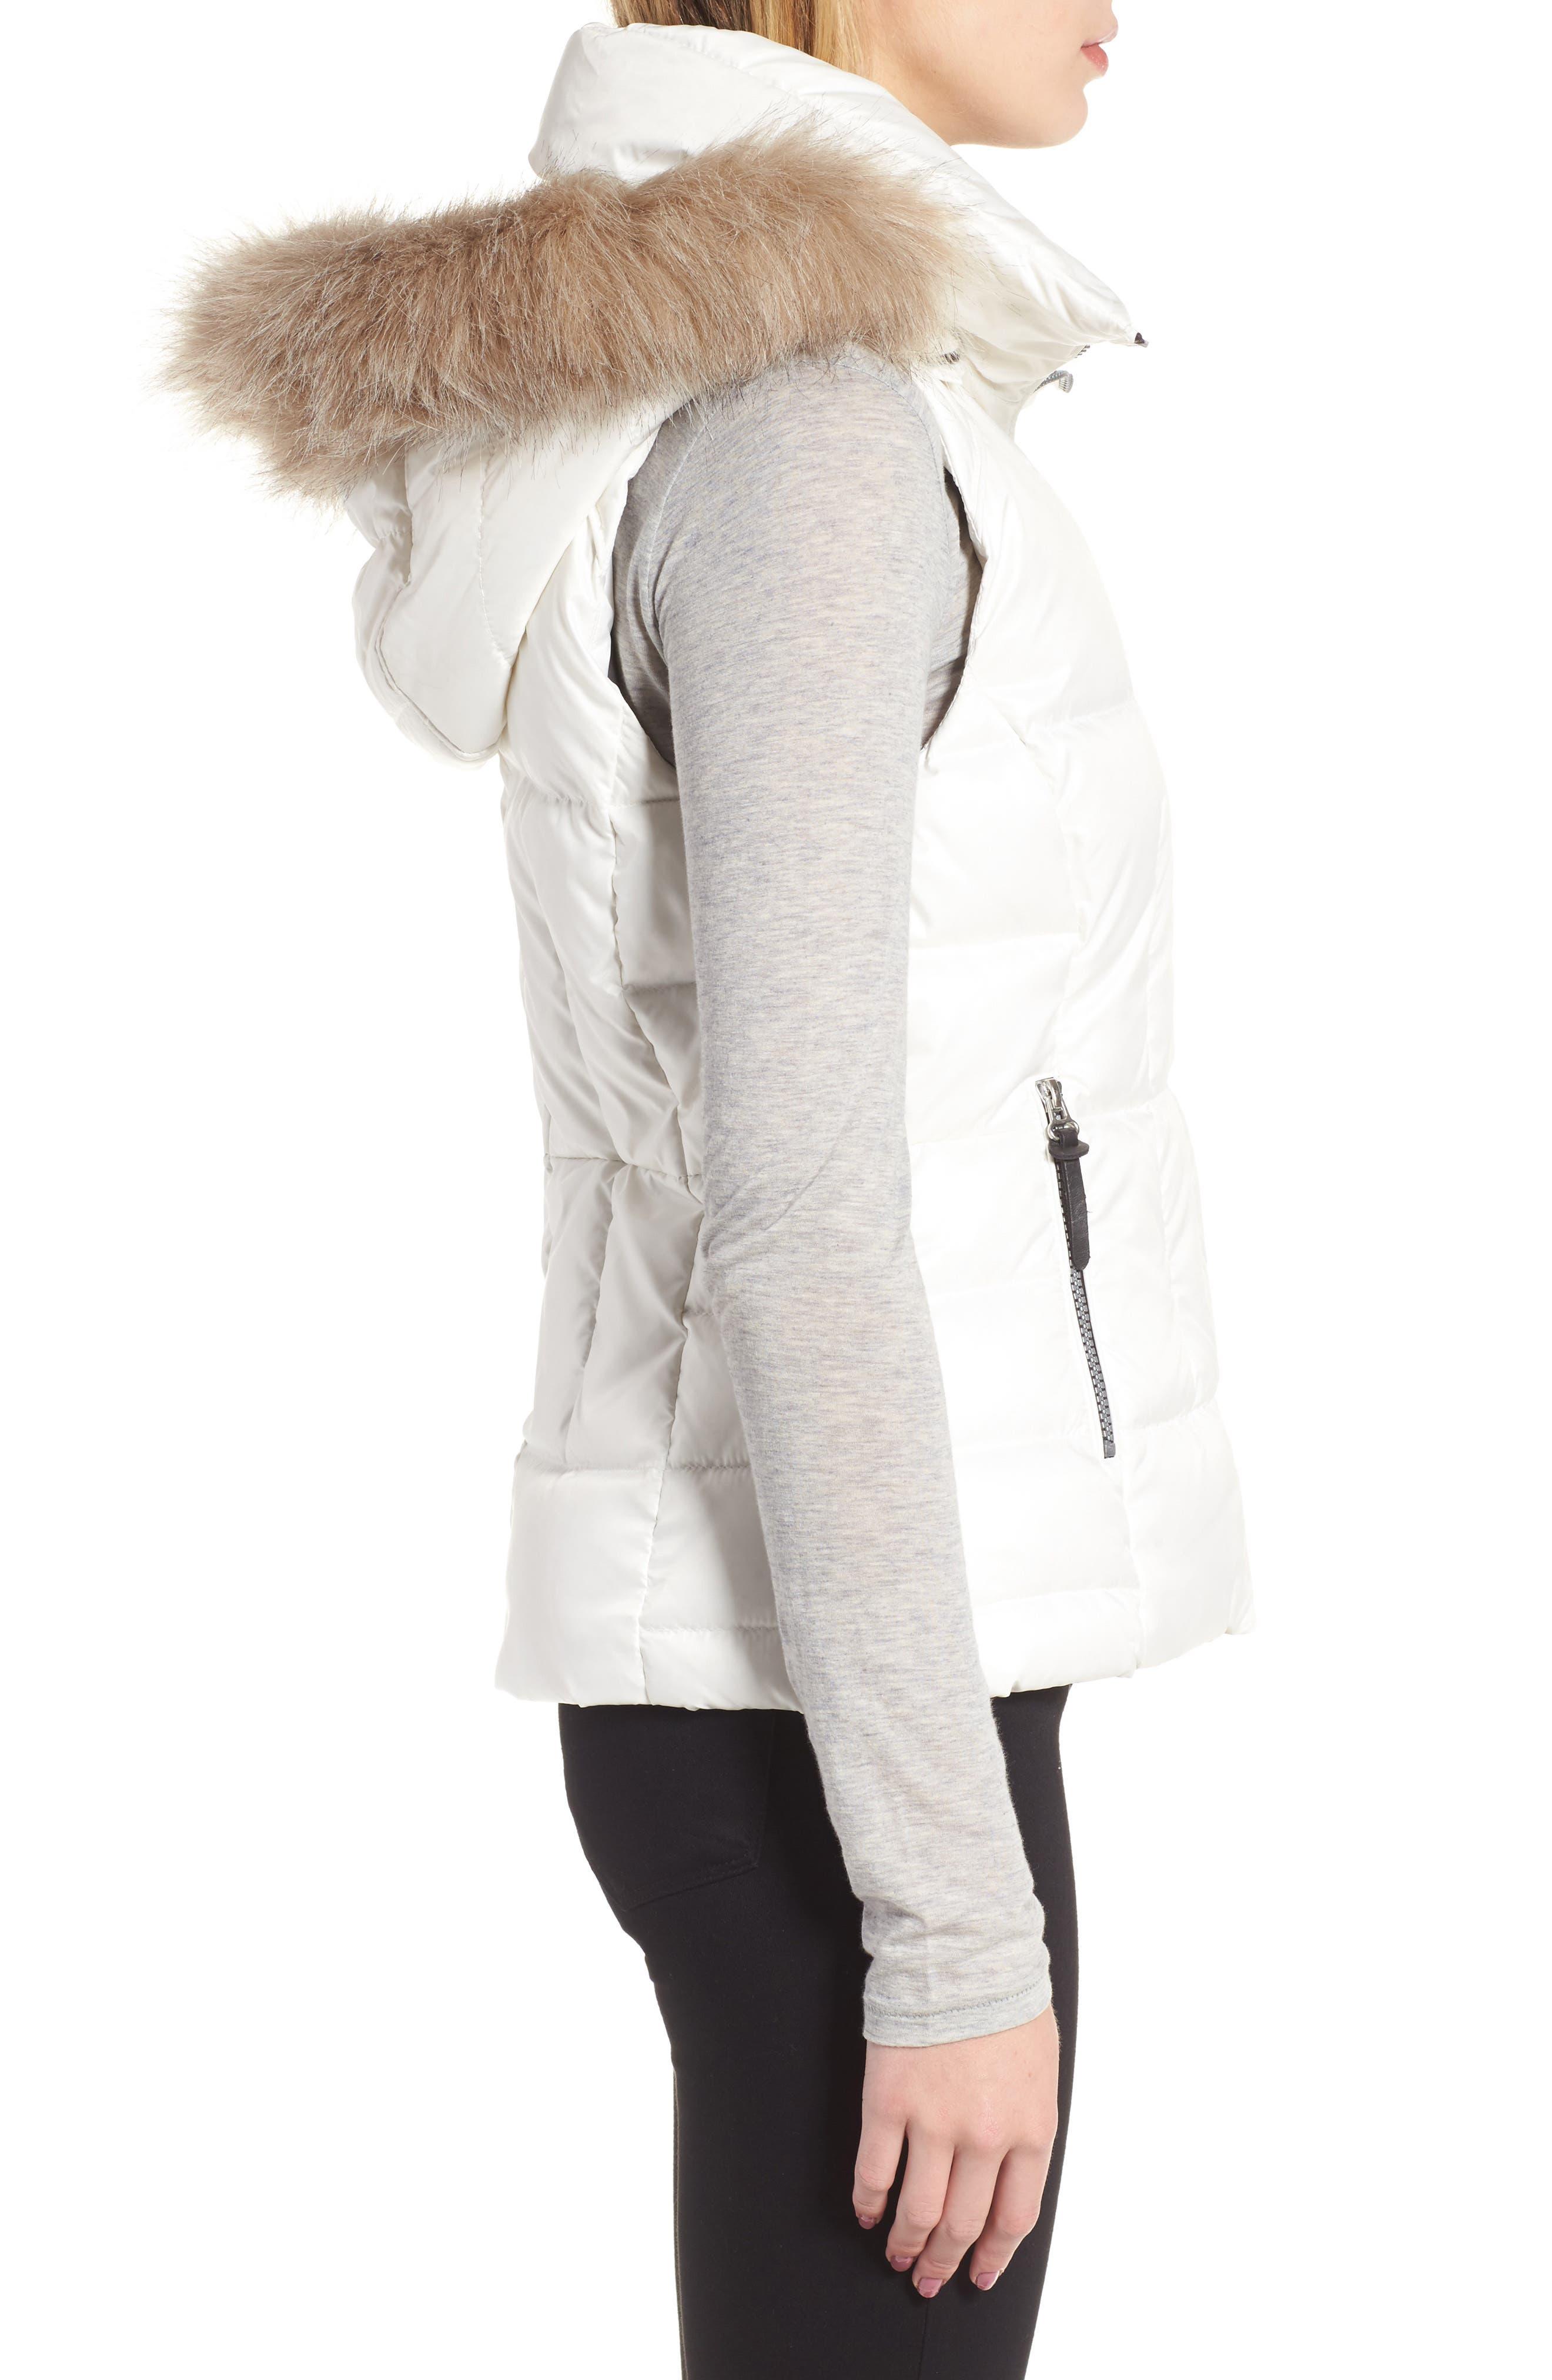 Lanie Puffer Vest with Faux Fur,                             Alternate thumbnail 3, color,                             100